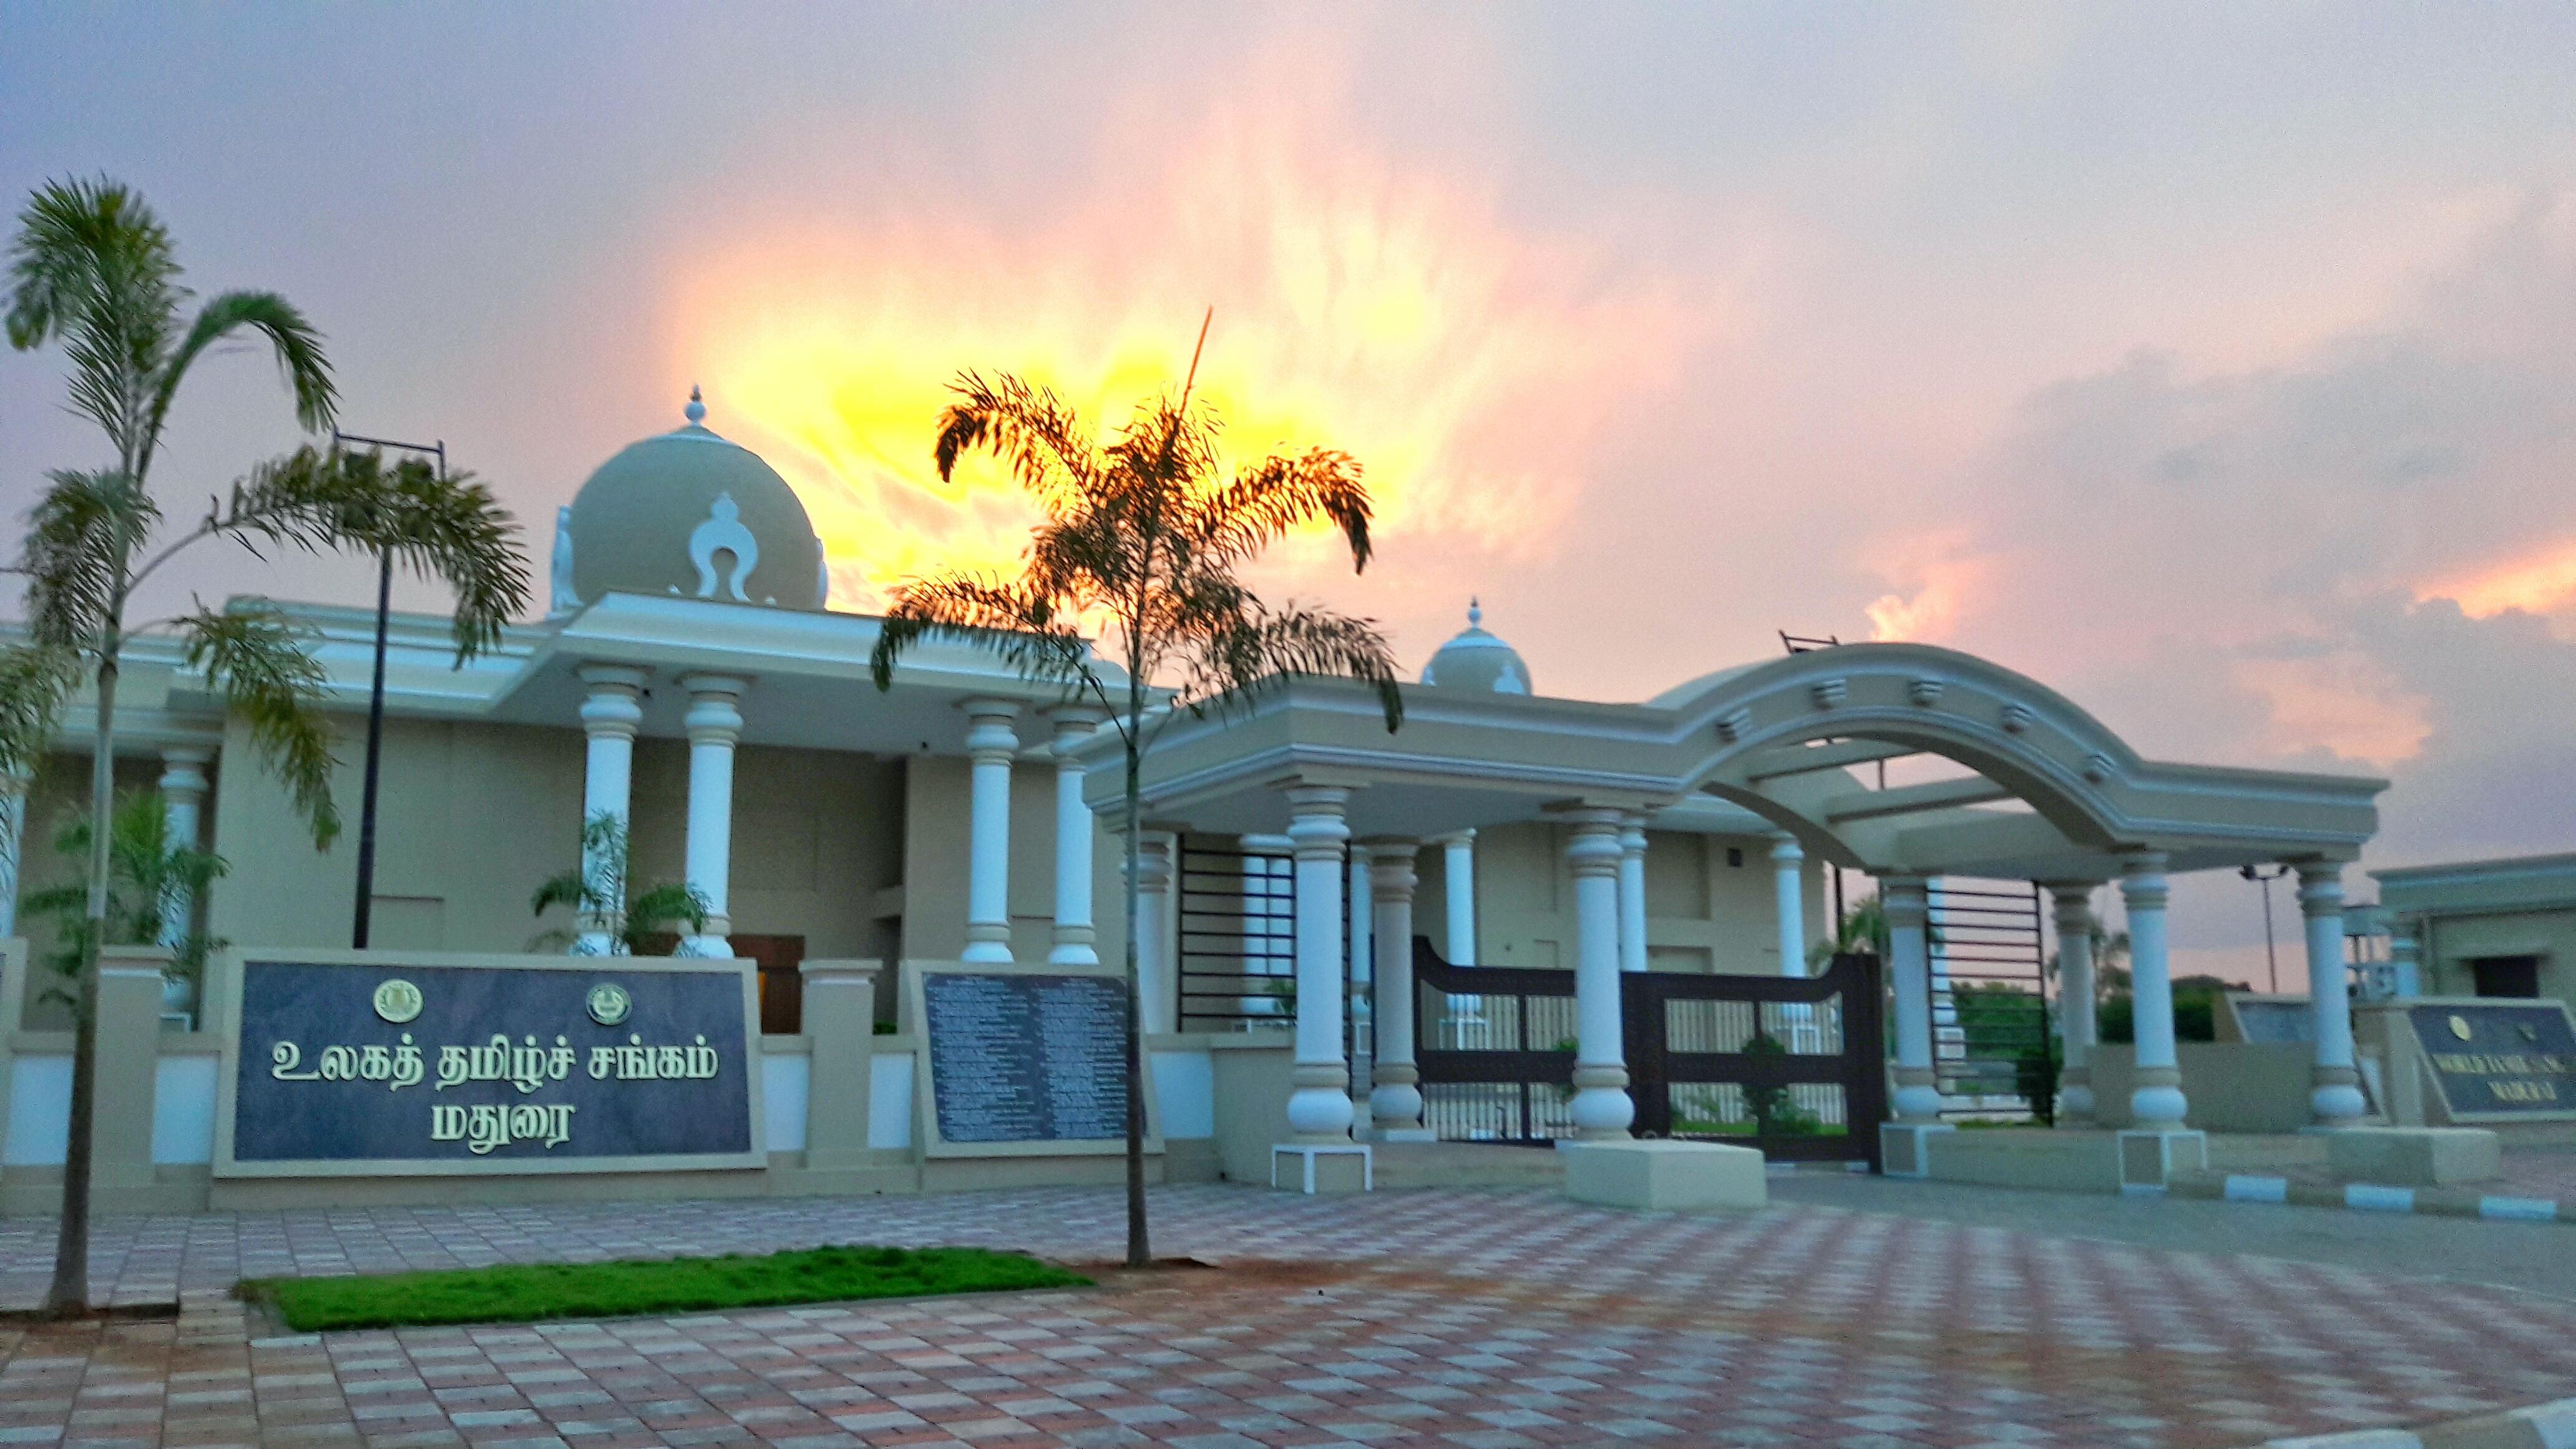 Ulaga Tamil Sangam - Wikipedia